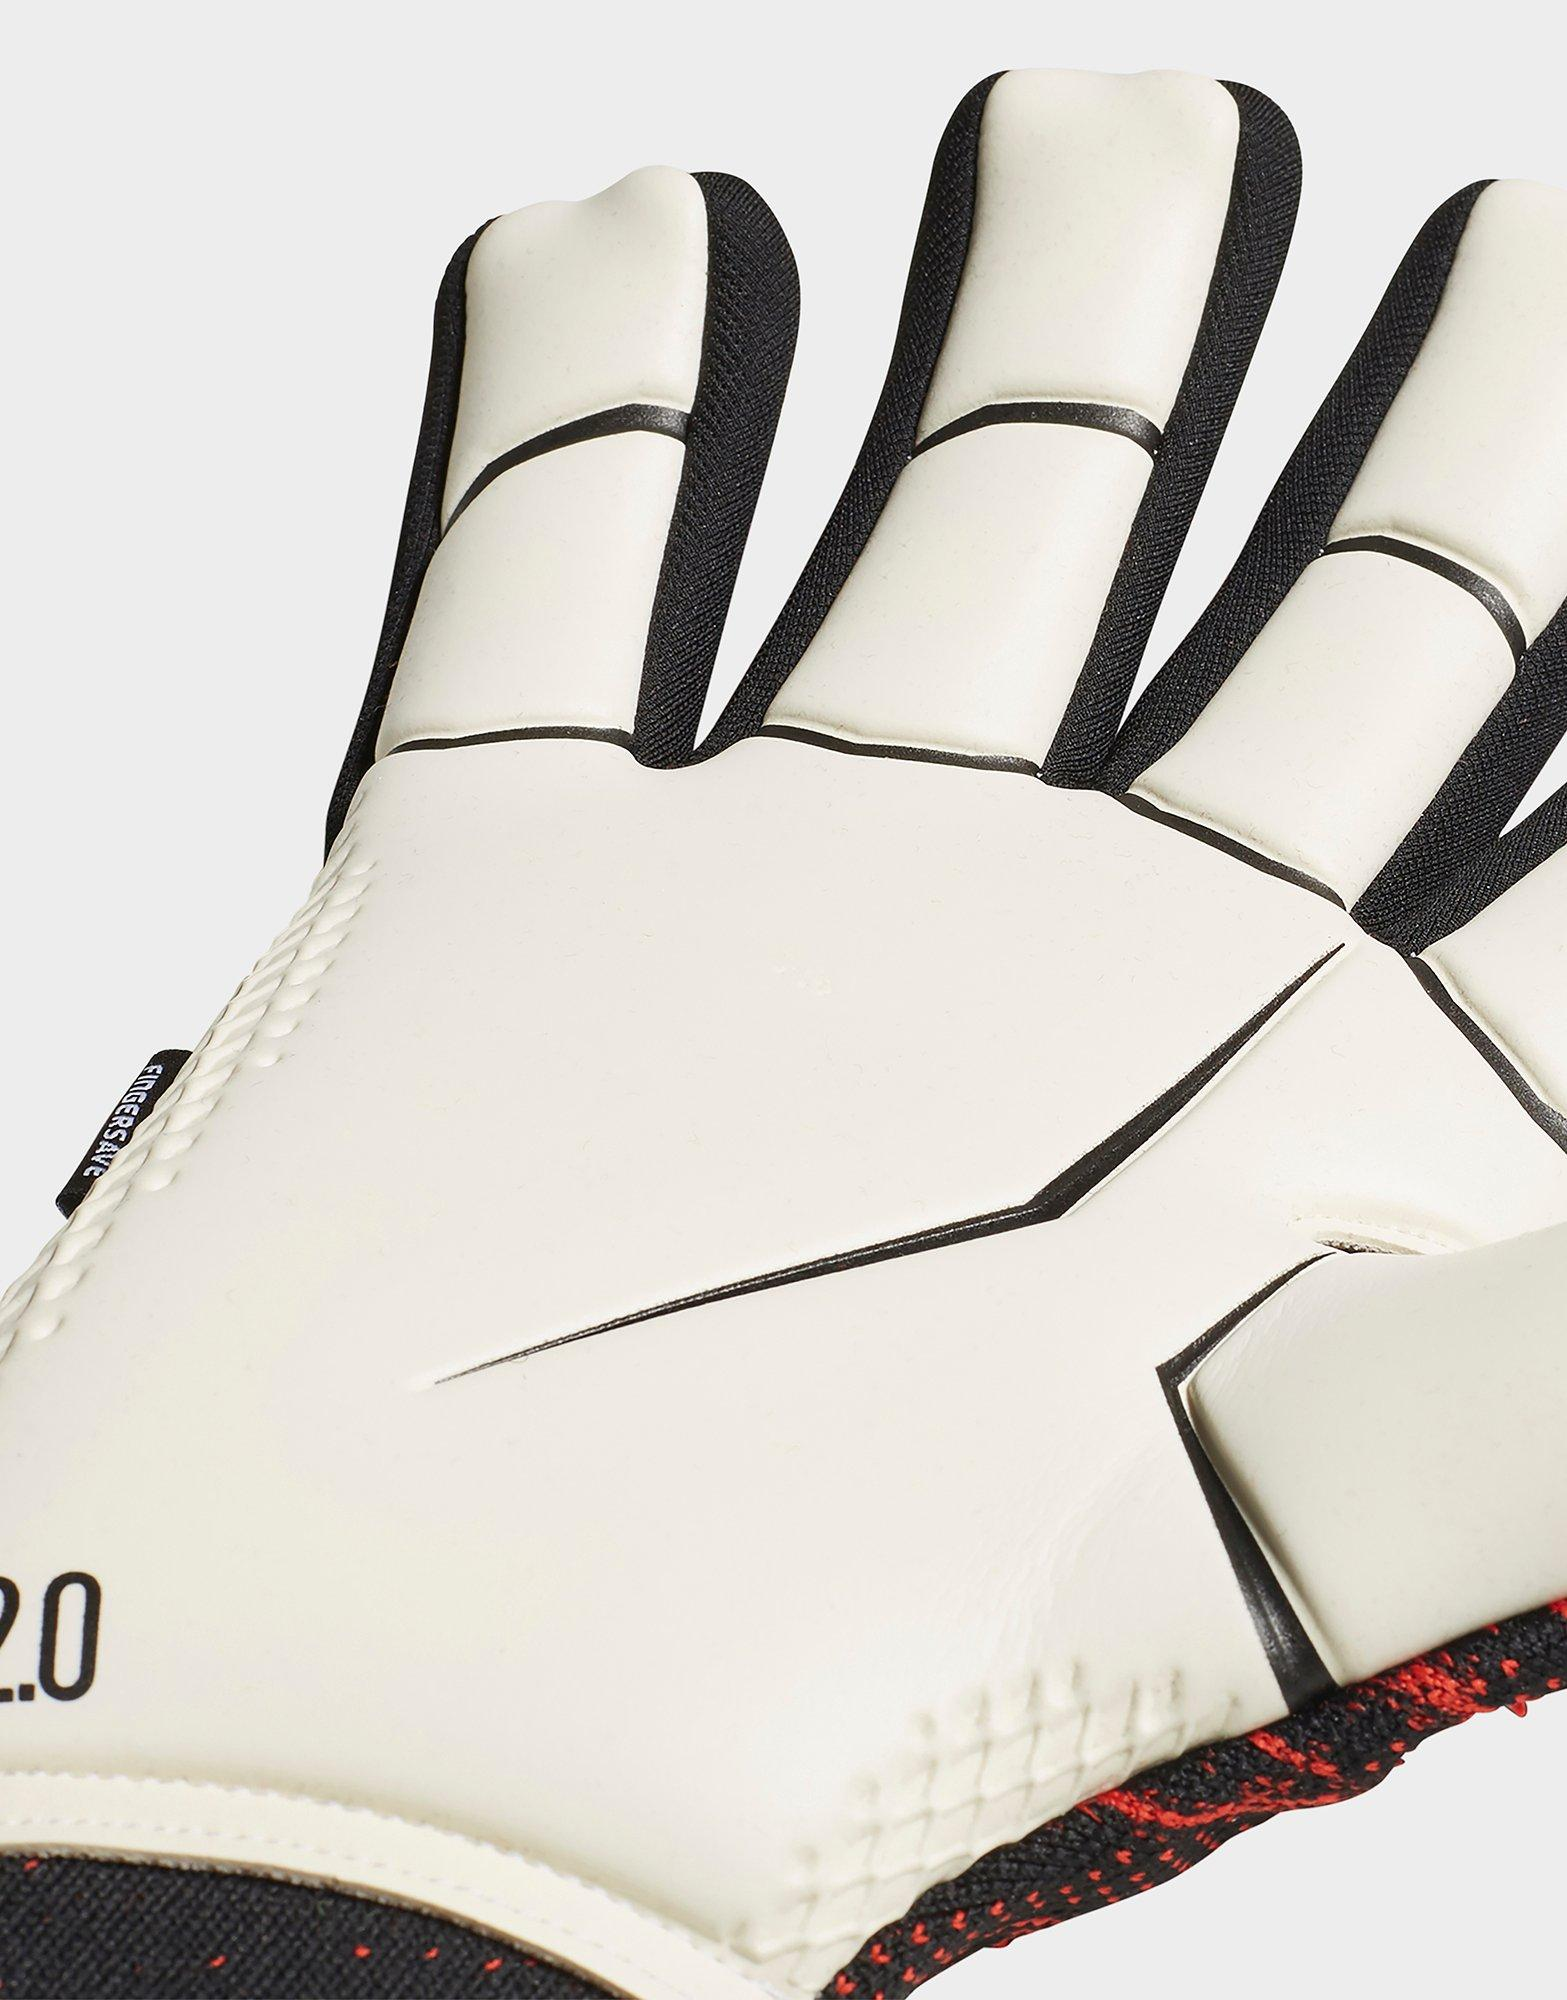 Predator 20 Training Gloves Black Mens in 2020 Adidas predator.